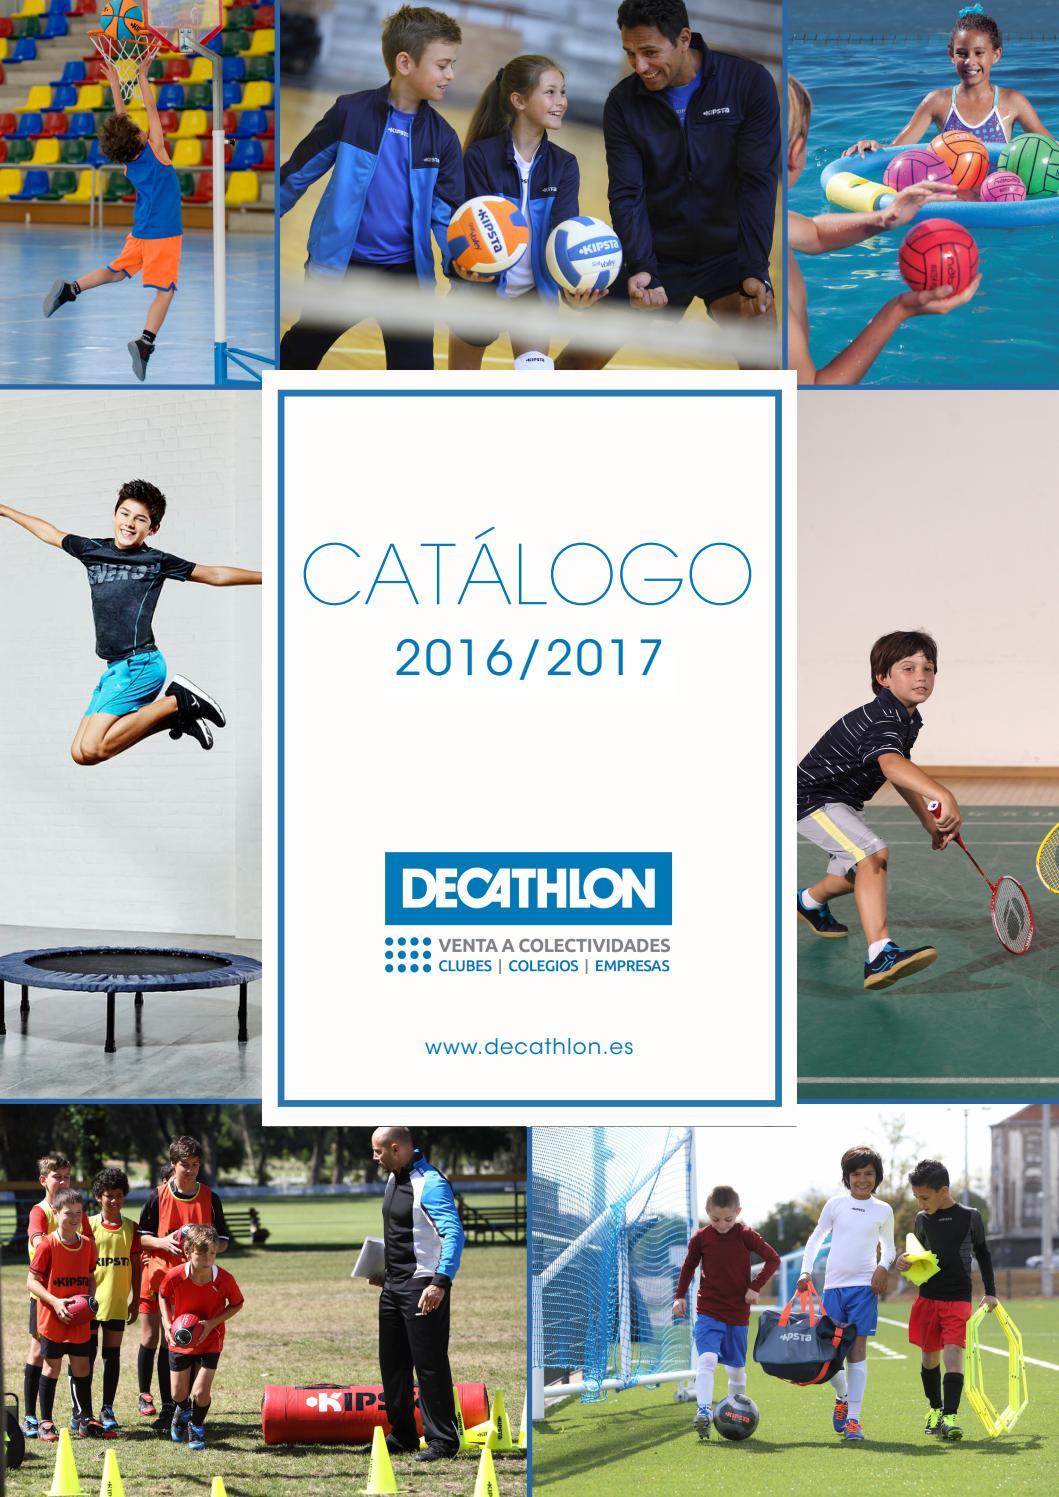 Catálogo colegios decathlon 20162017 castellano by Decathlon España - issuu 492cabd436d0